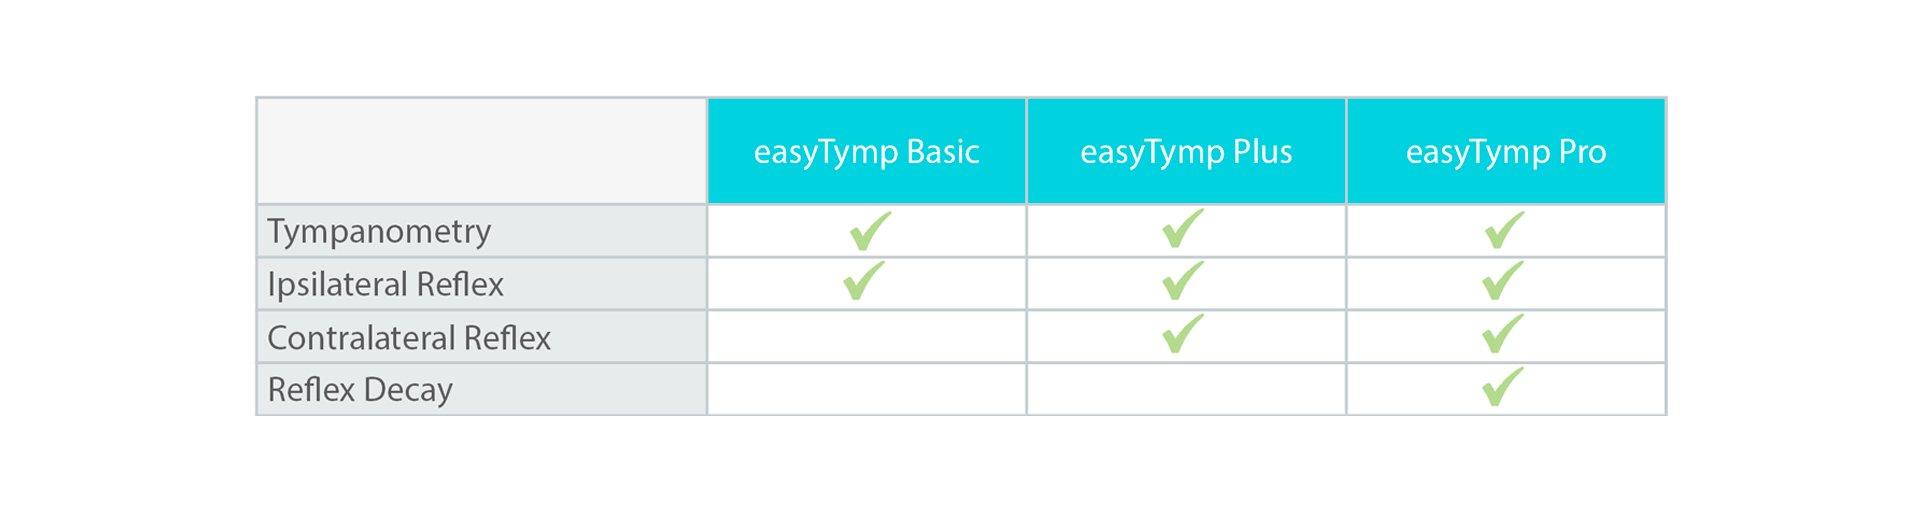 easytymp_versions_table